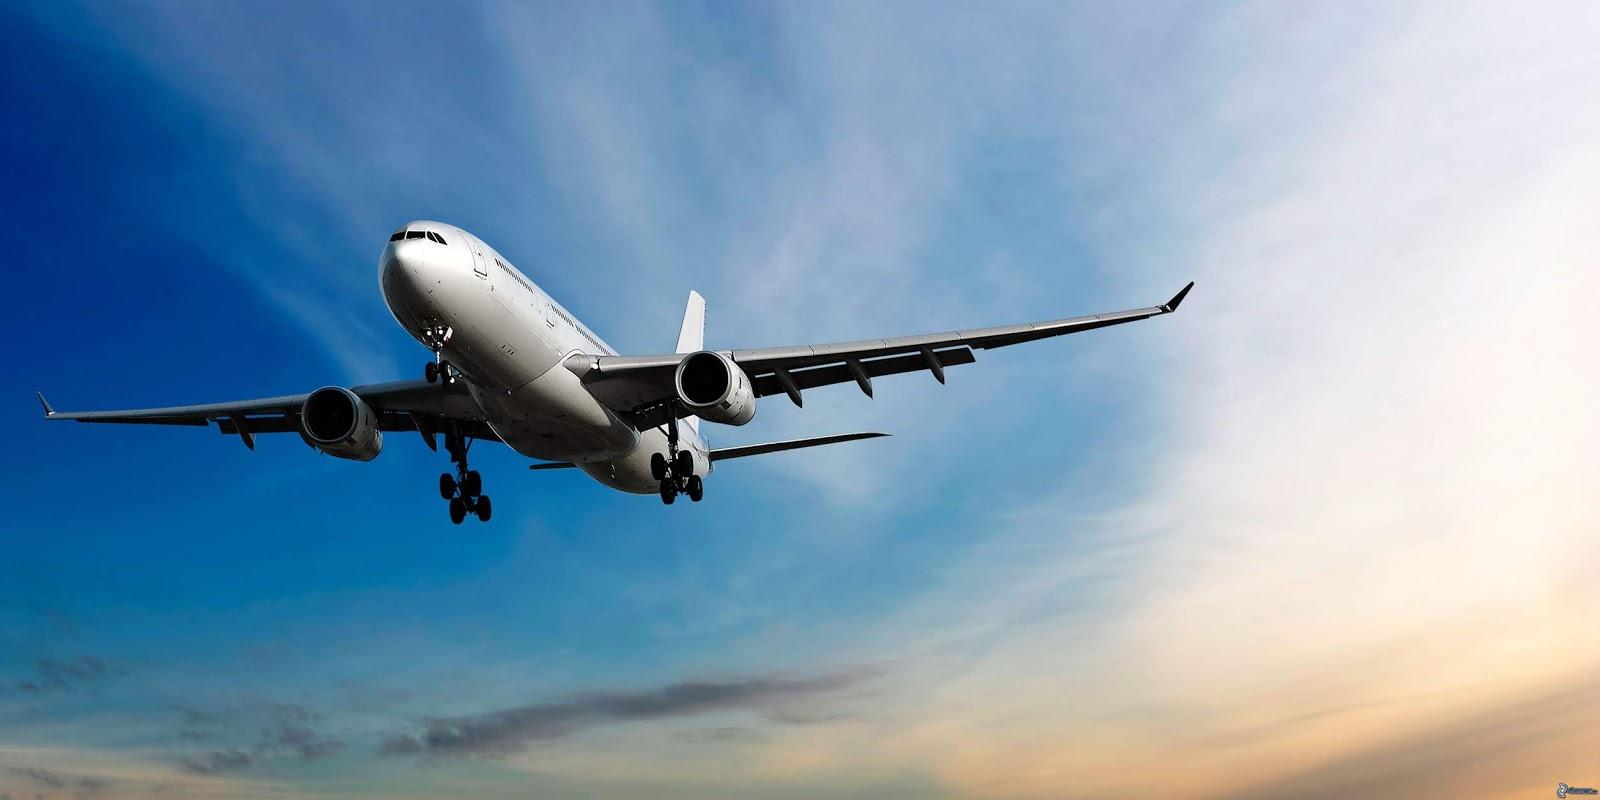 Boeing 777 air plane Wallpapers Hd